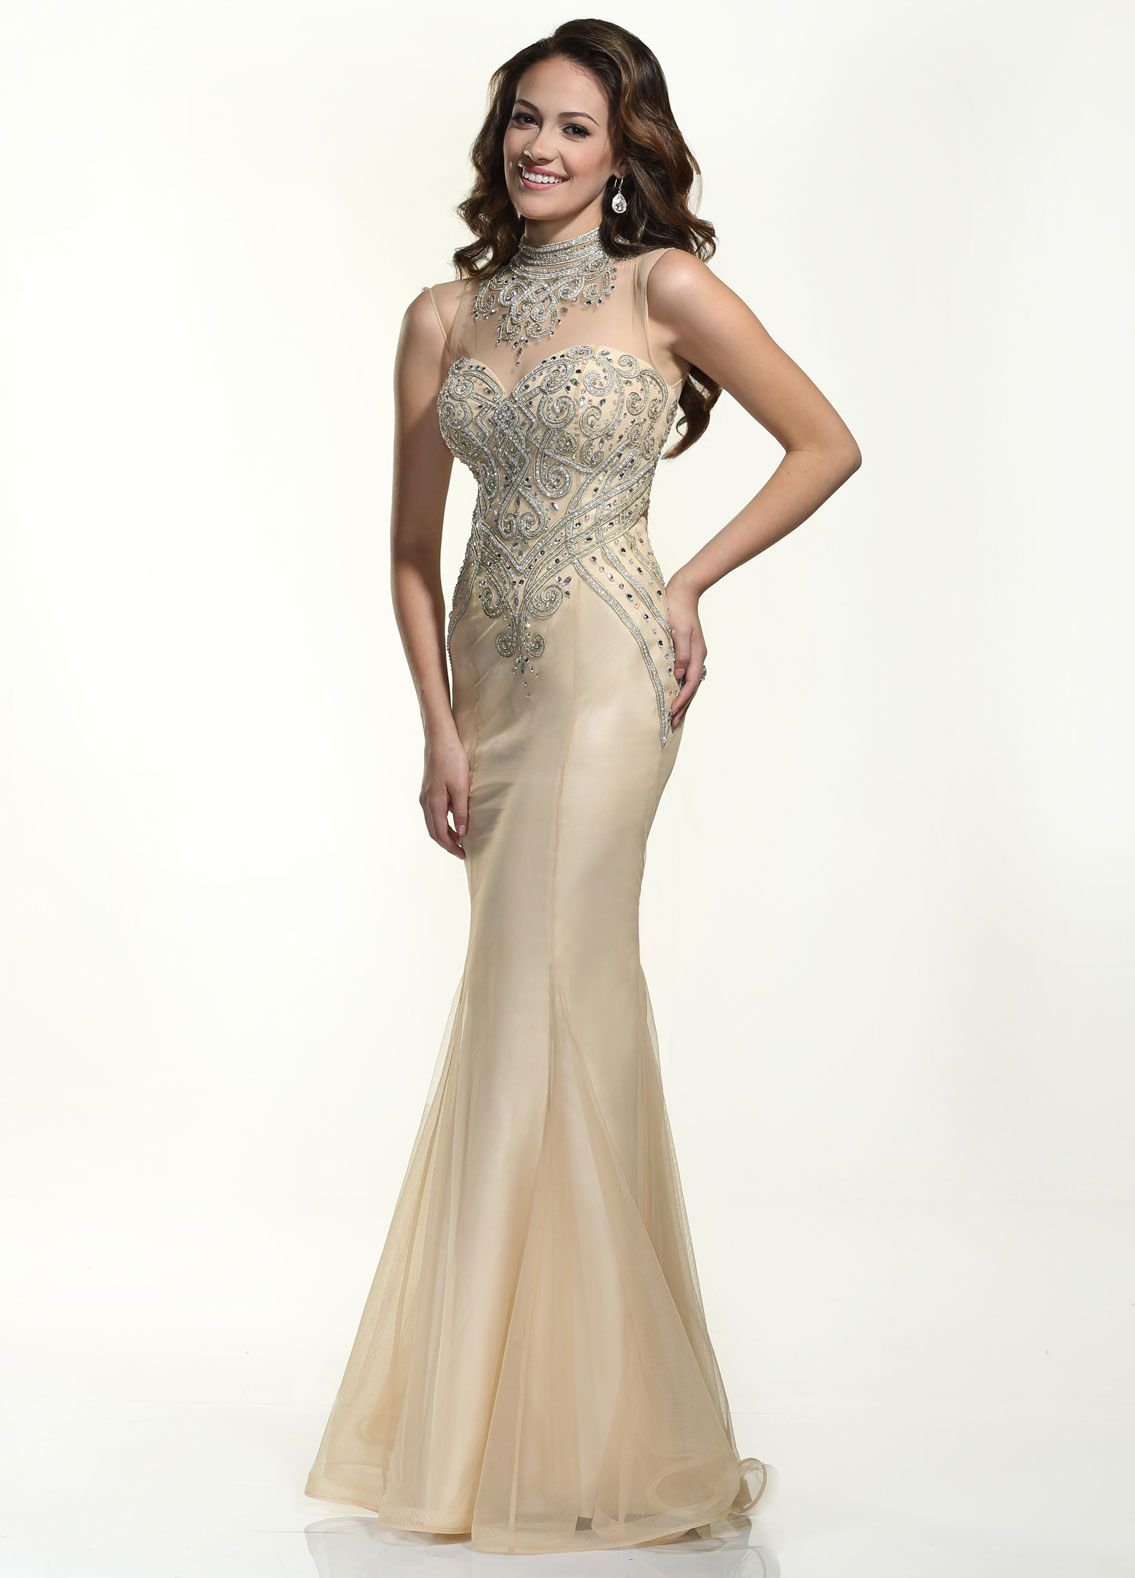 DE 35790 Nude/ Gold size 2 | Xcite/ Xtreme/ Disney Enchanted gowns ...